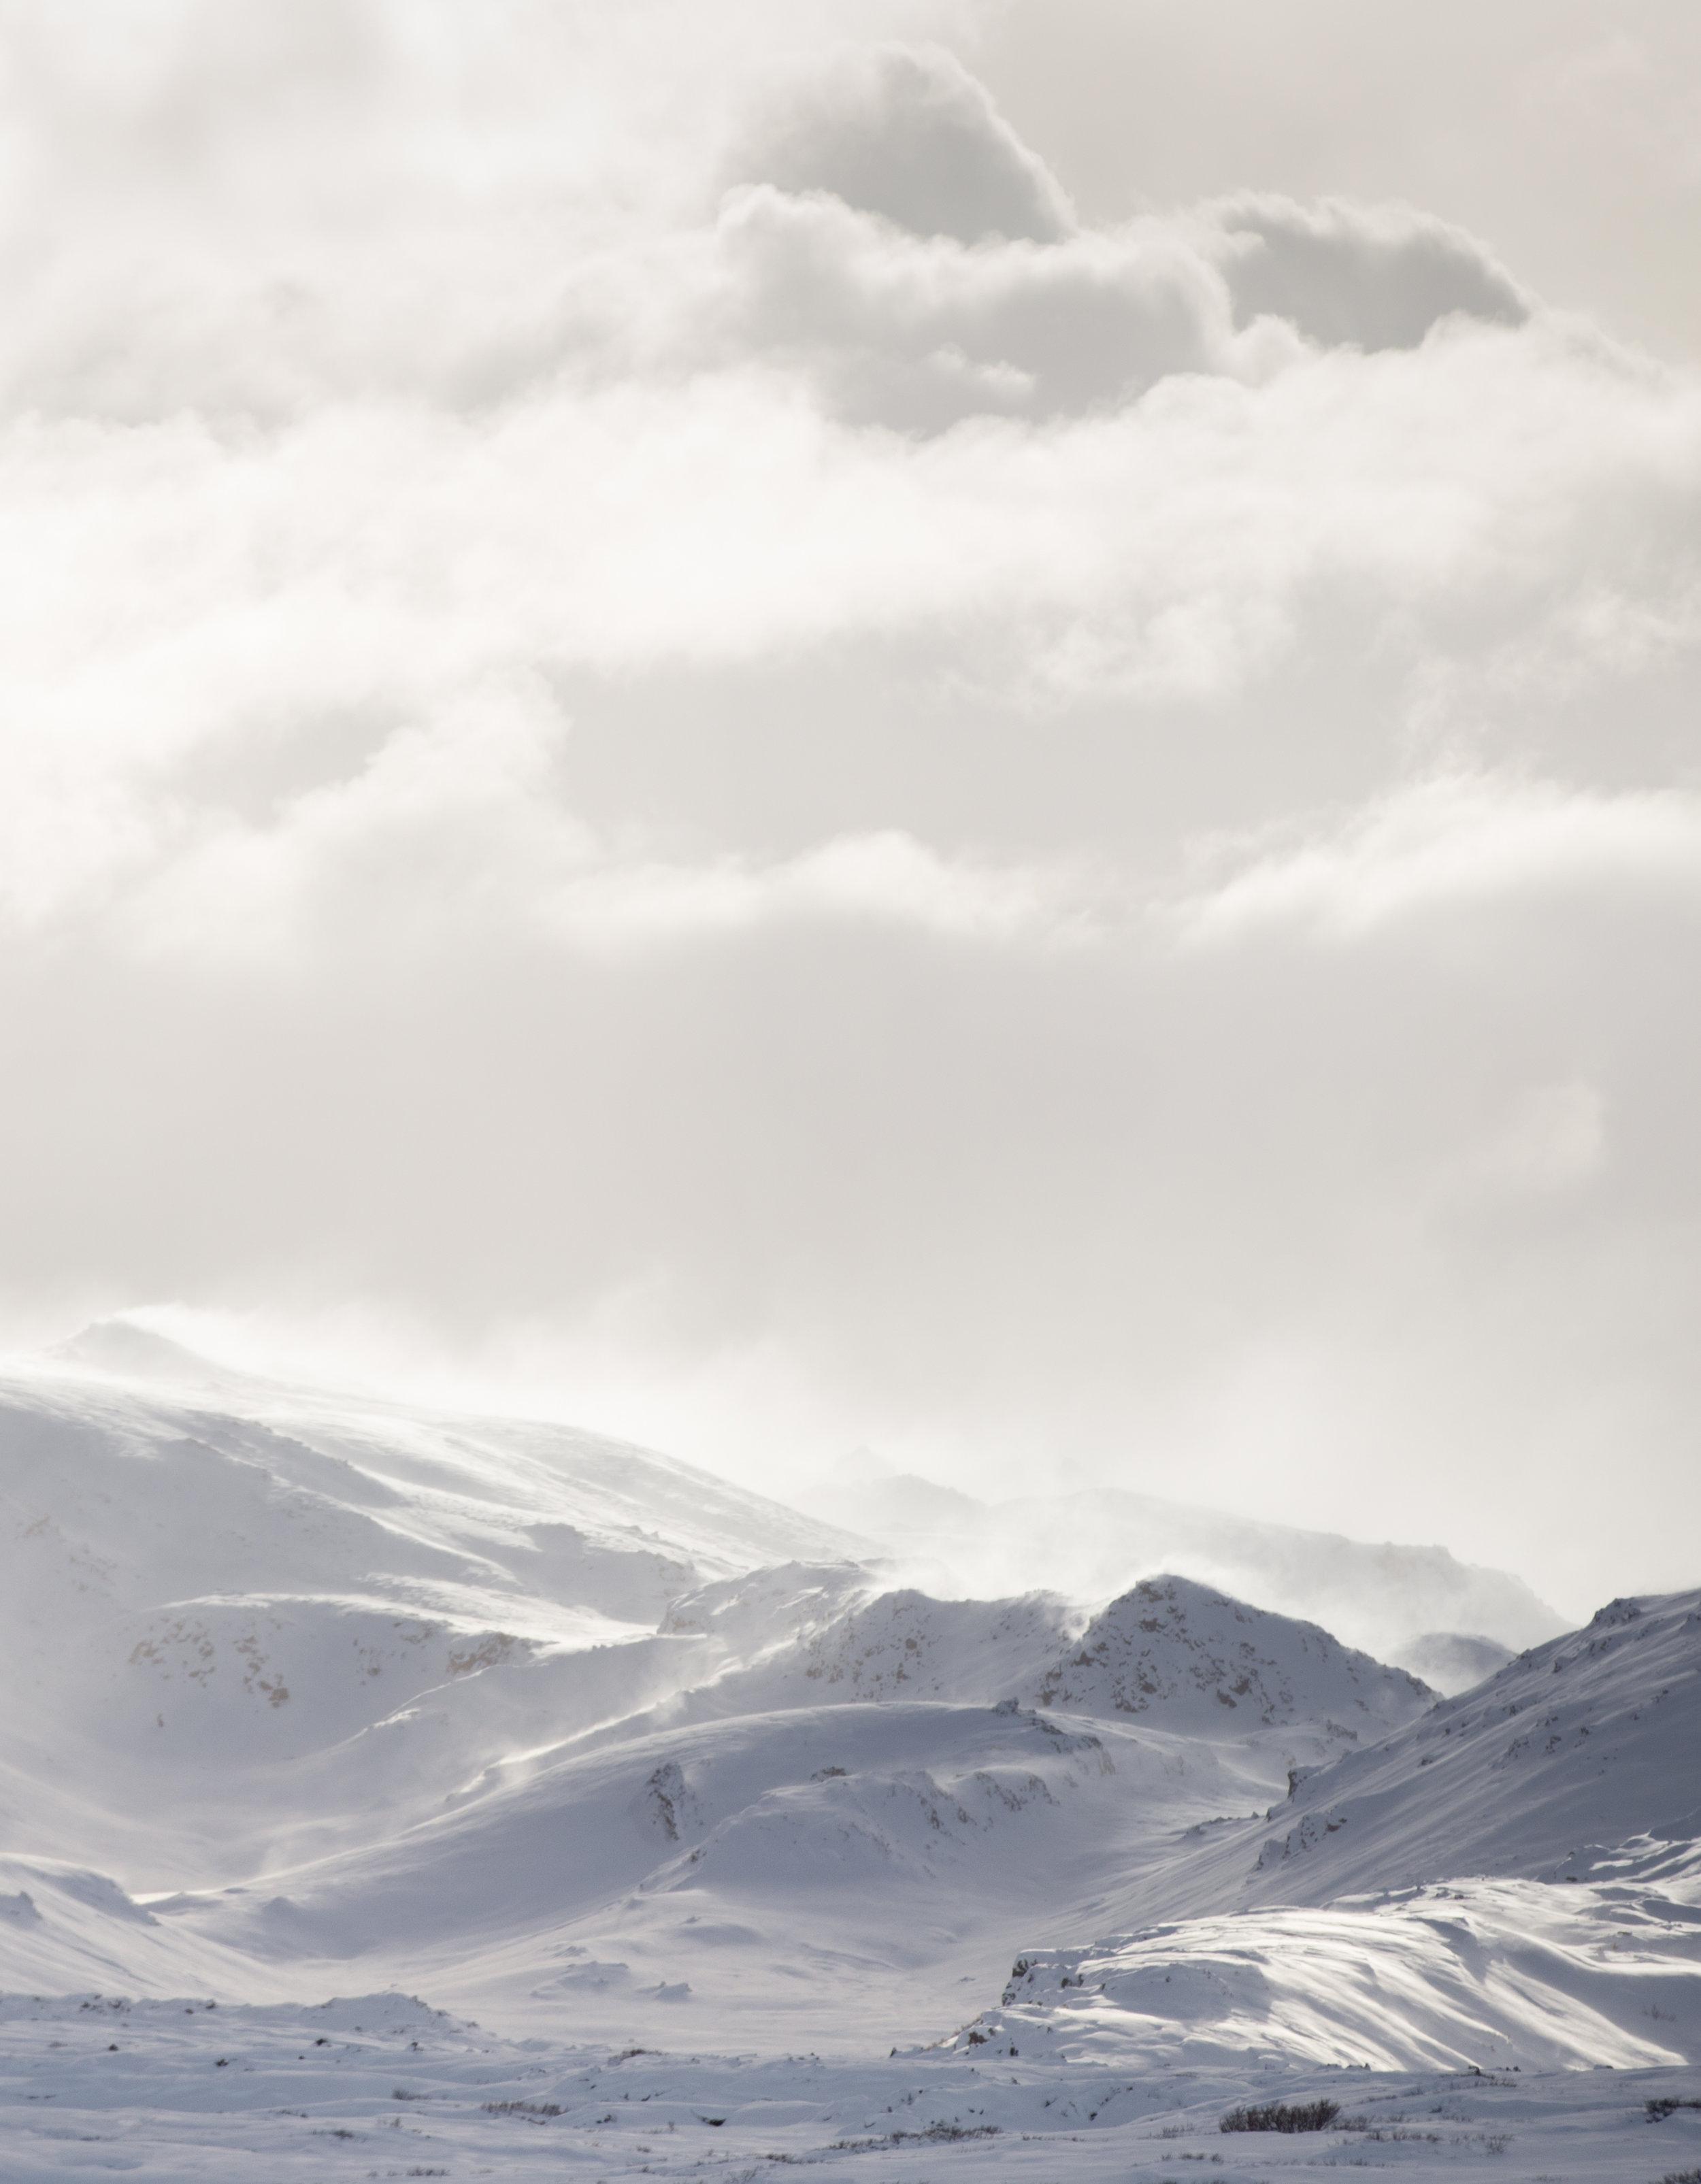 jermiah-schuster-iceland-470.jpg